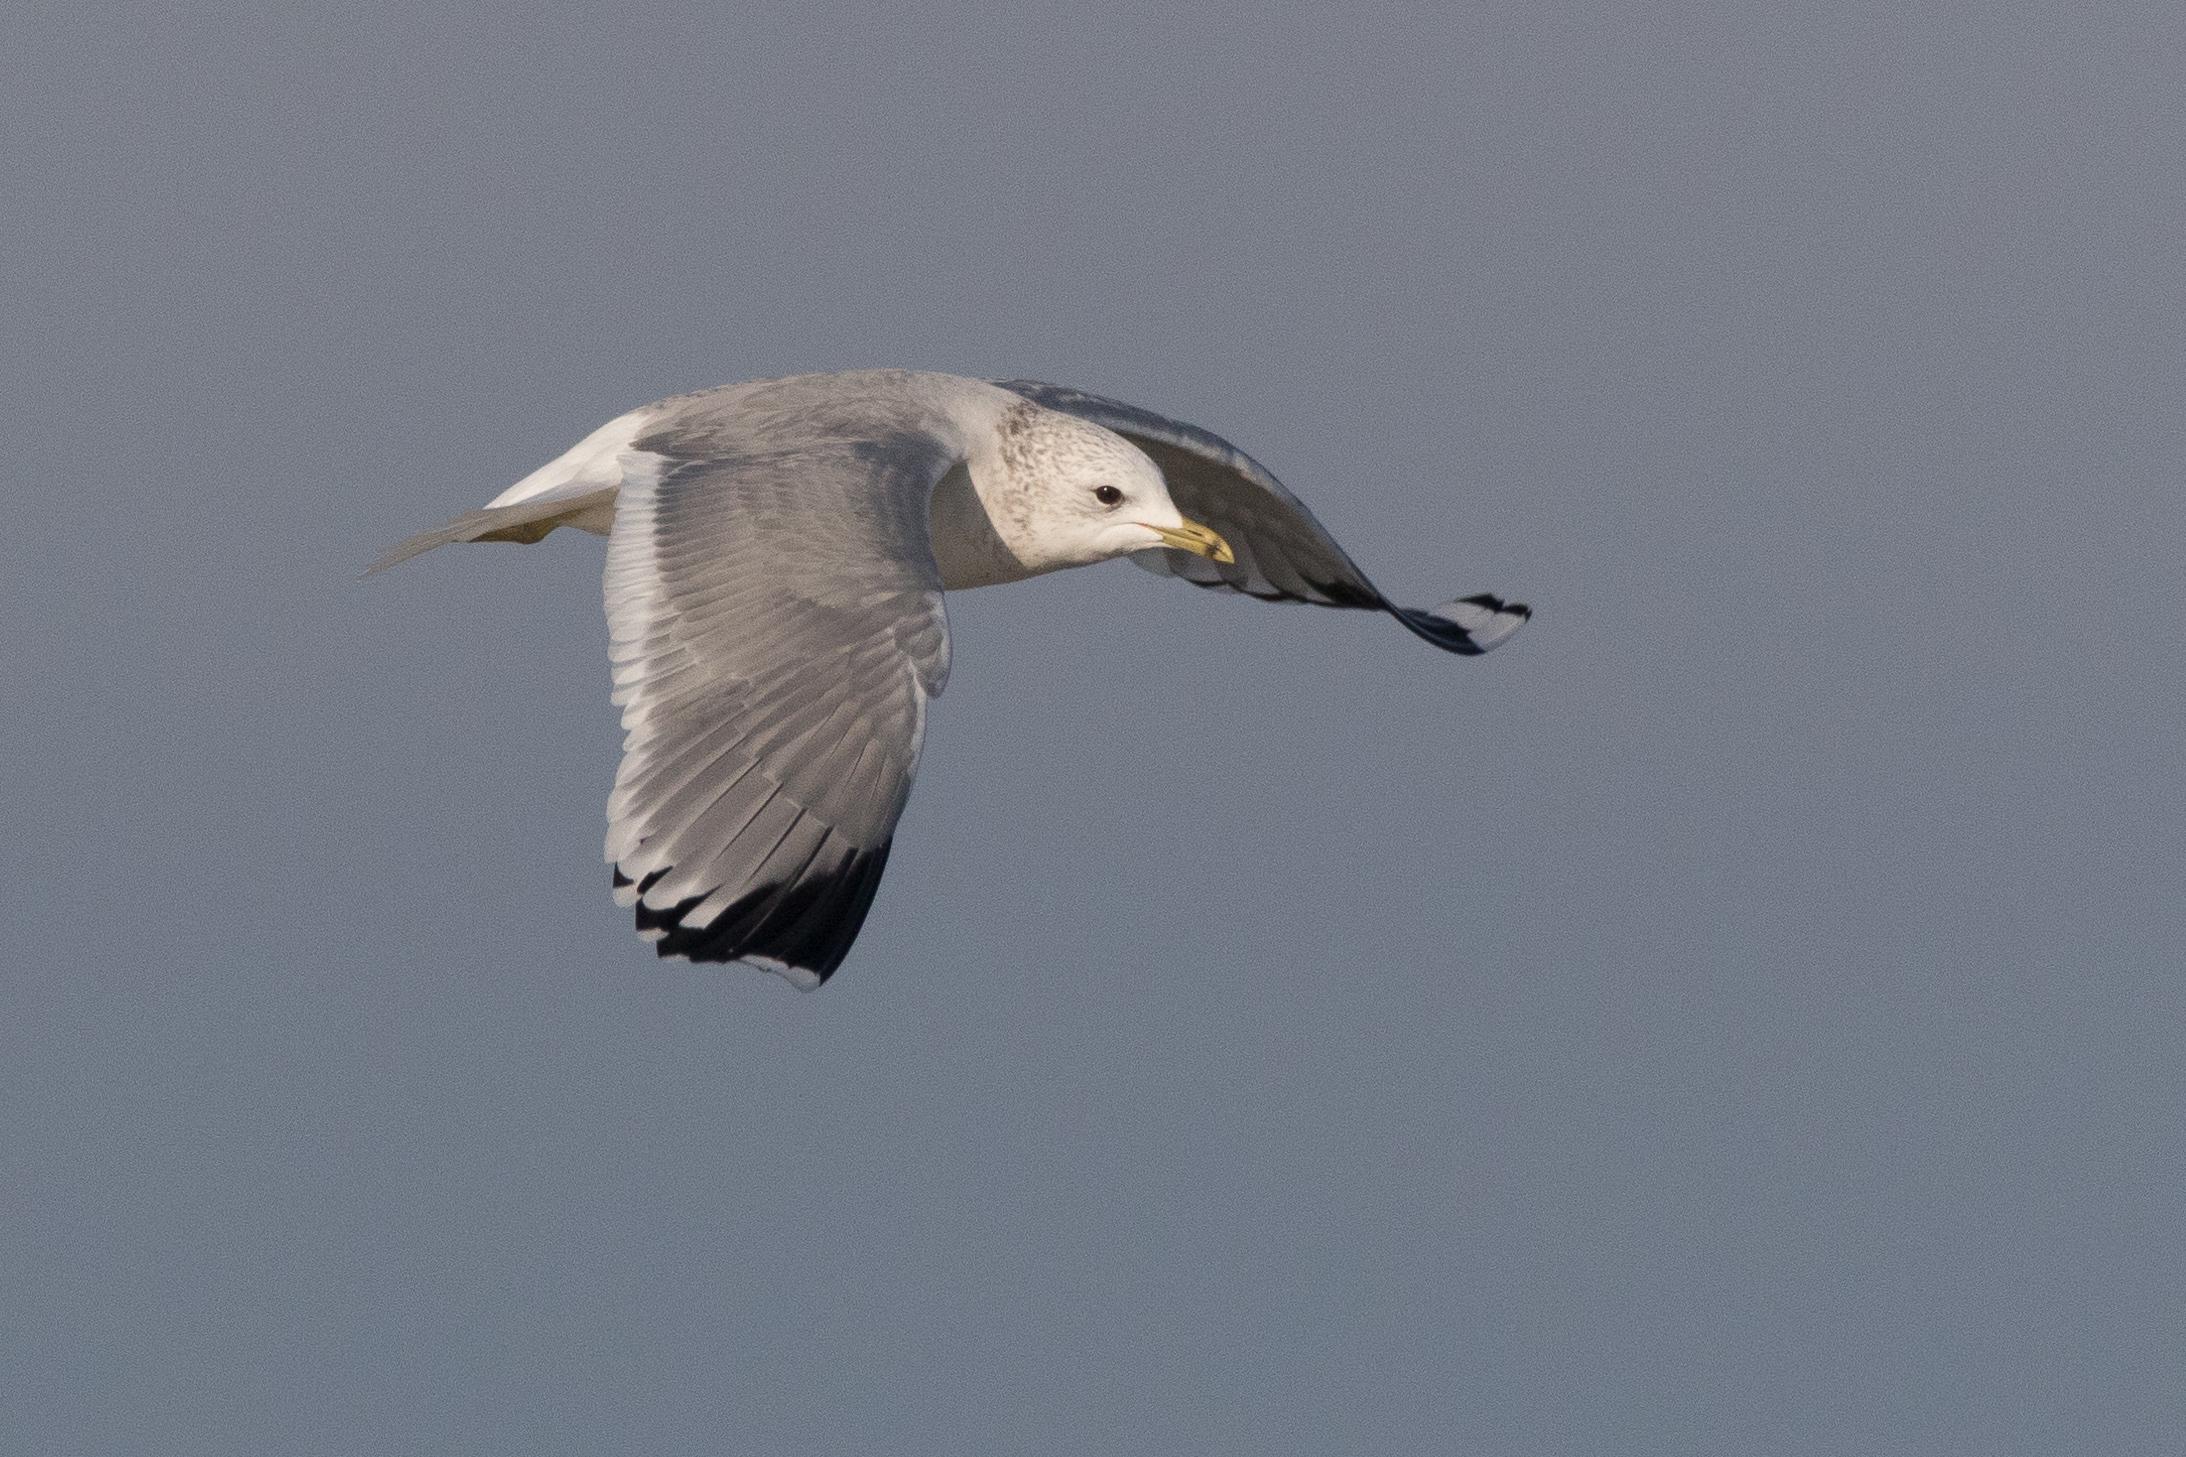 20170121-Common Gull Adult-74.jpg